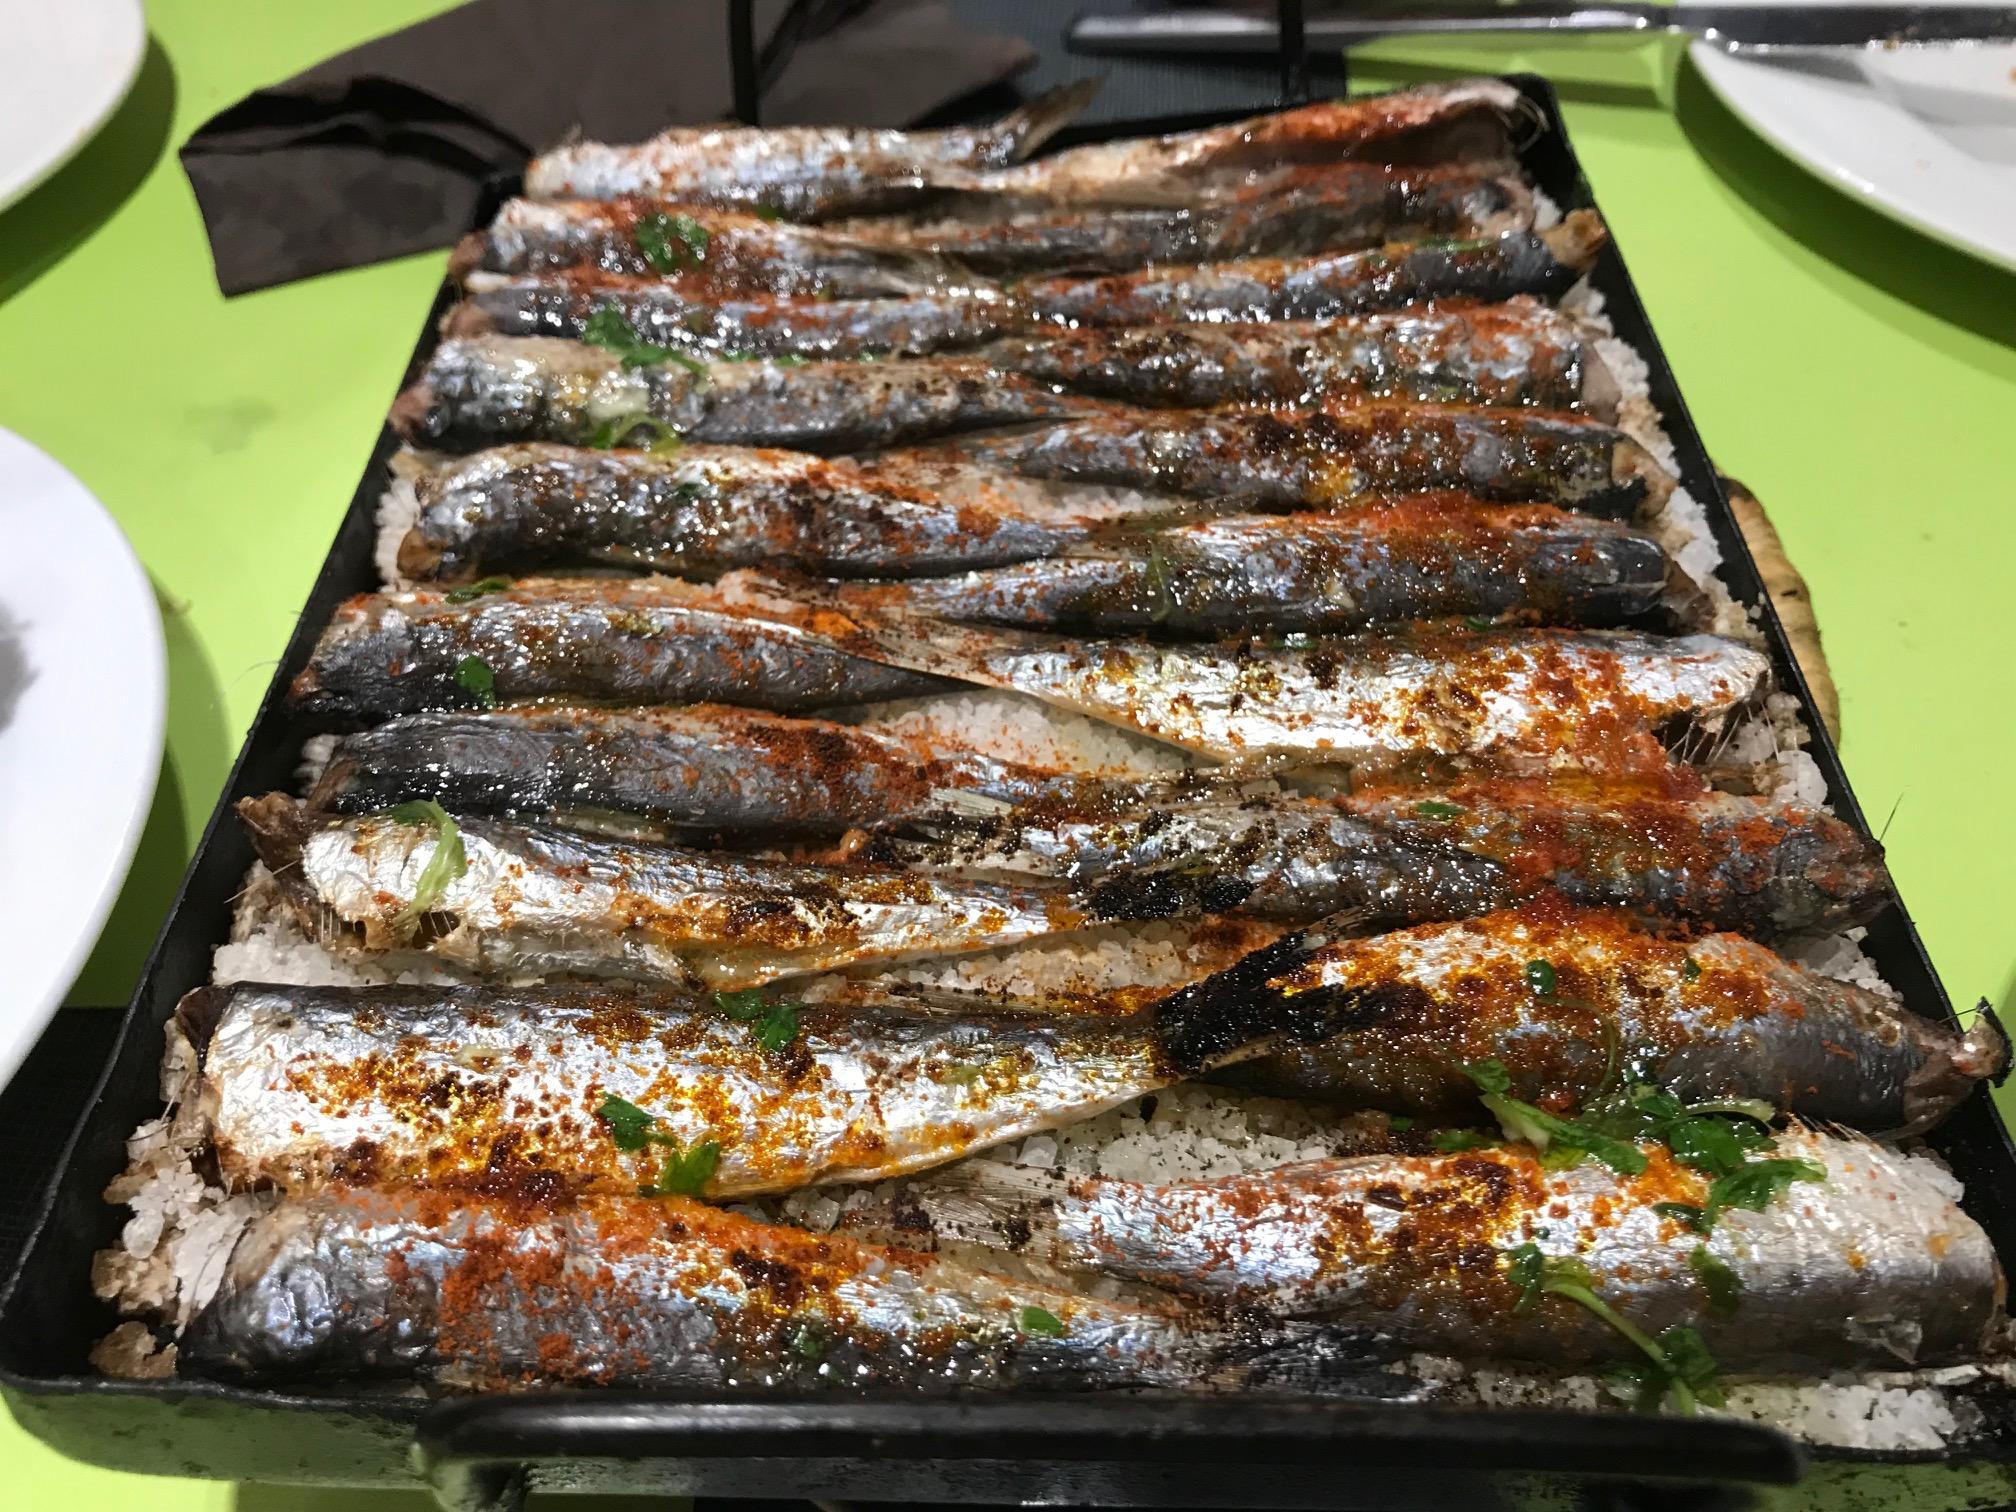 La Mossegada Las sardinas el plato estrella.